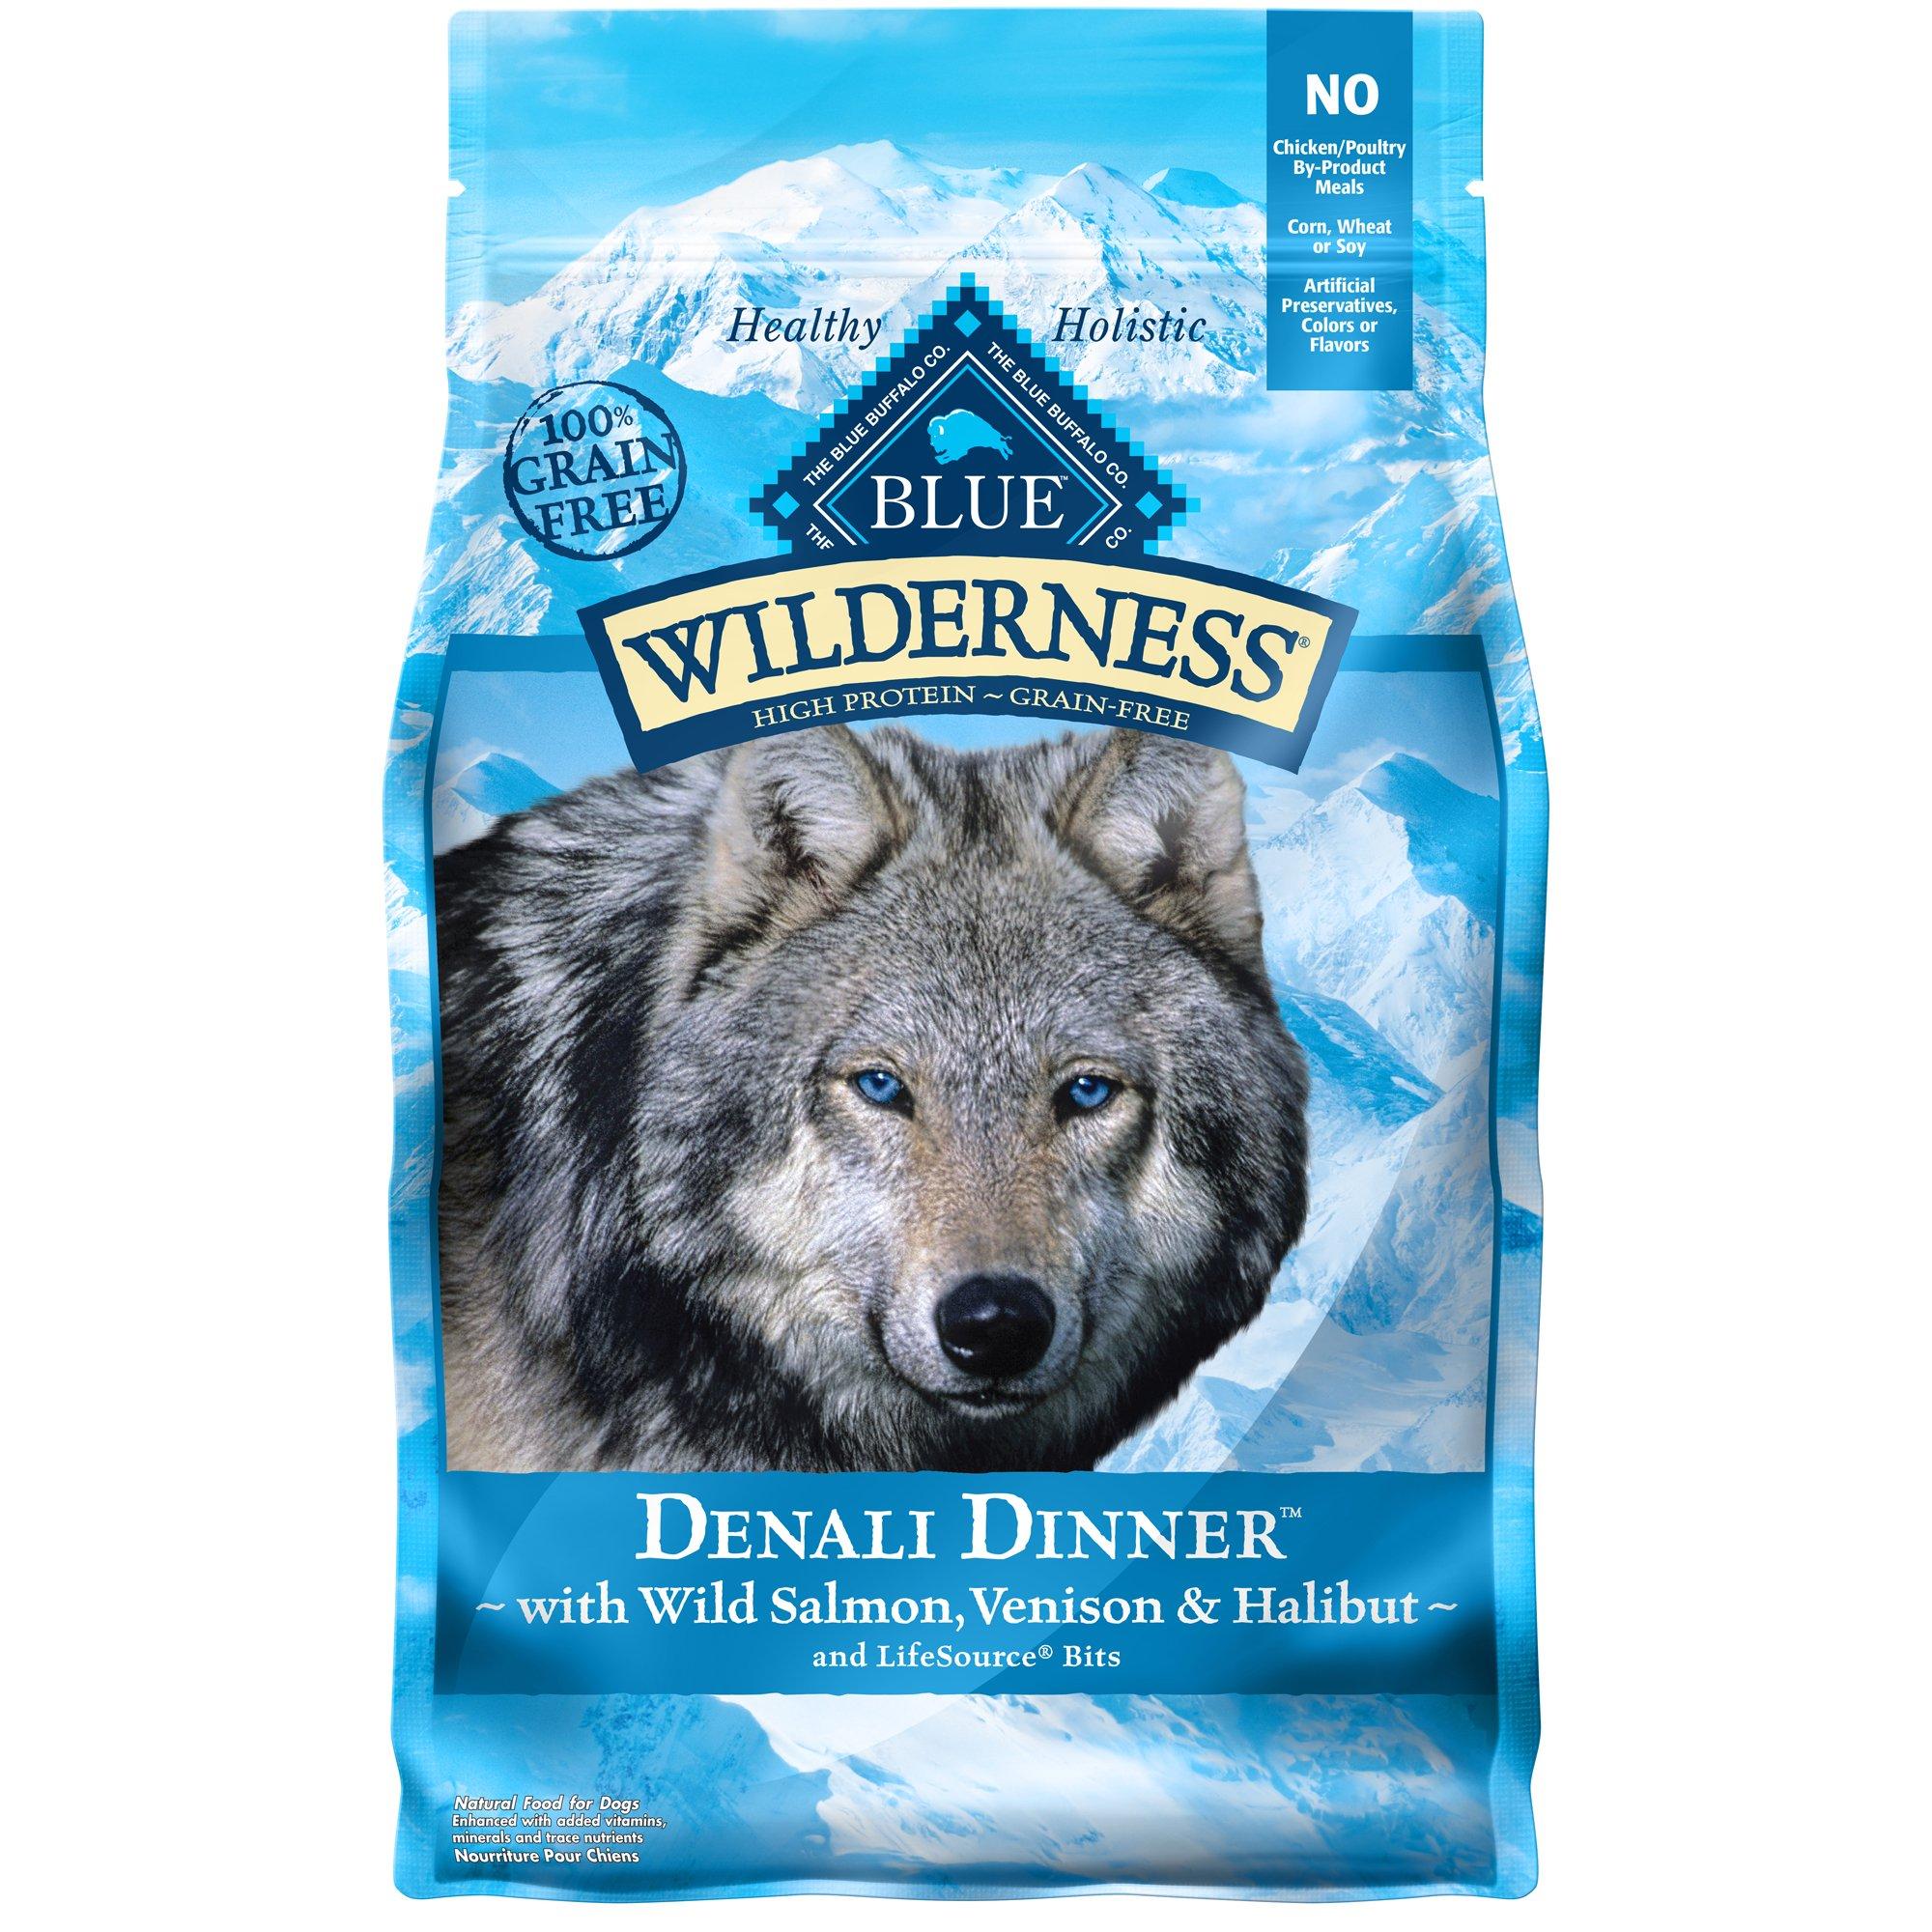 Wilderness Dog Food